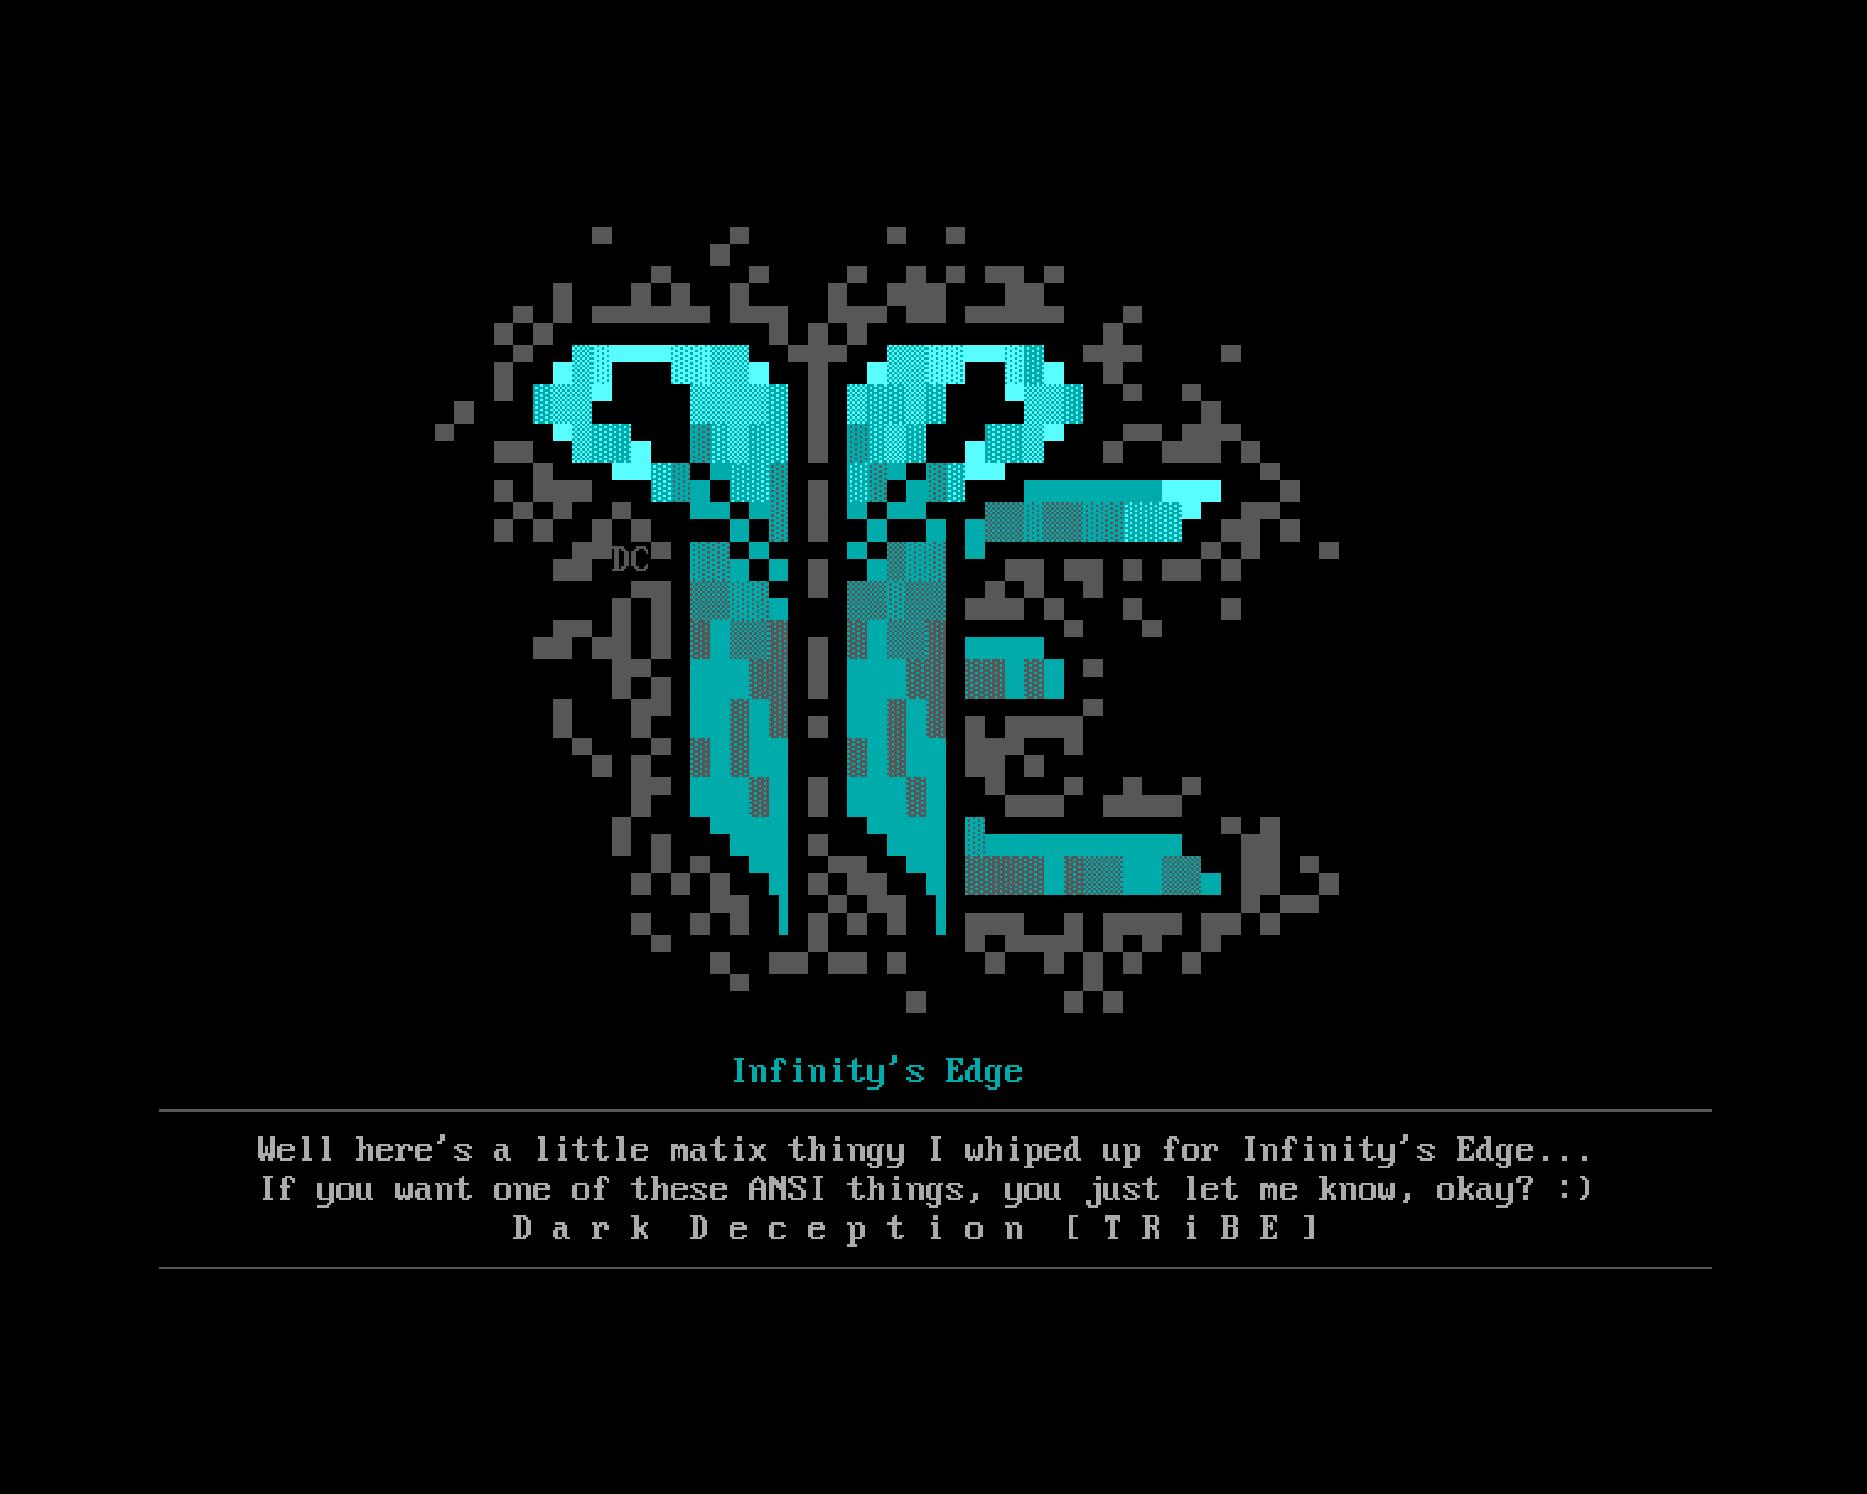 Infinity's Edge ANSI art